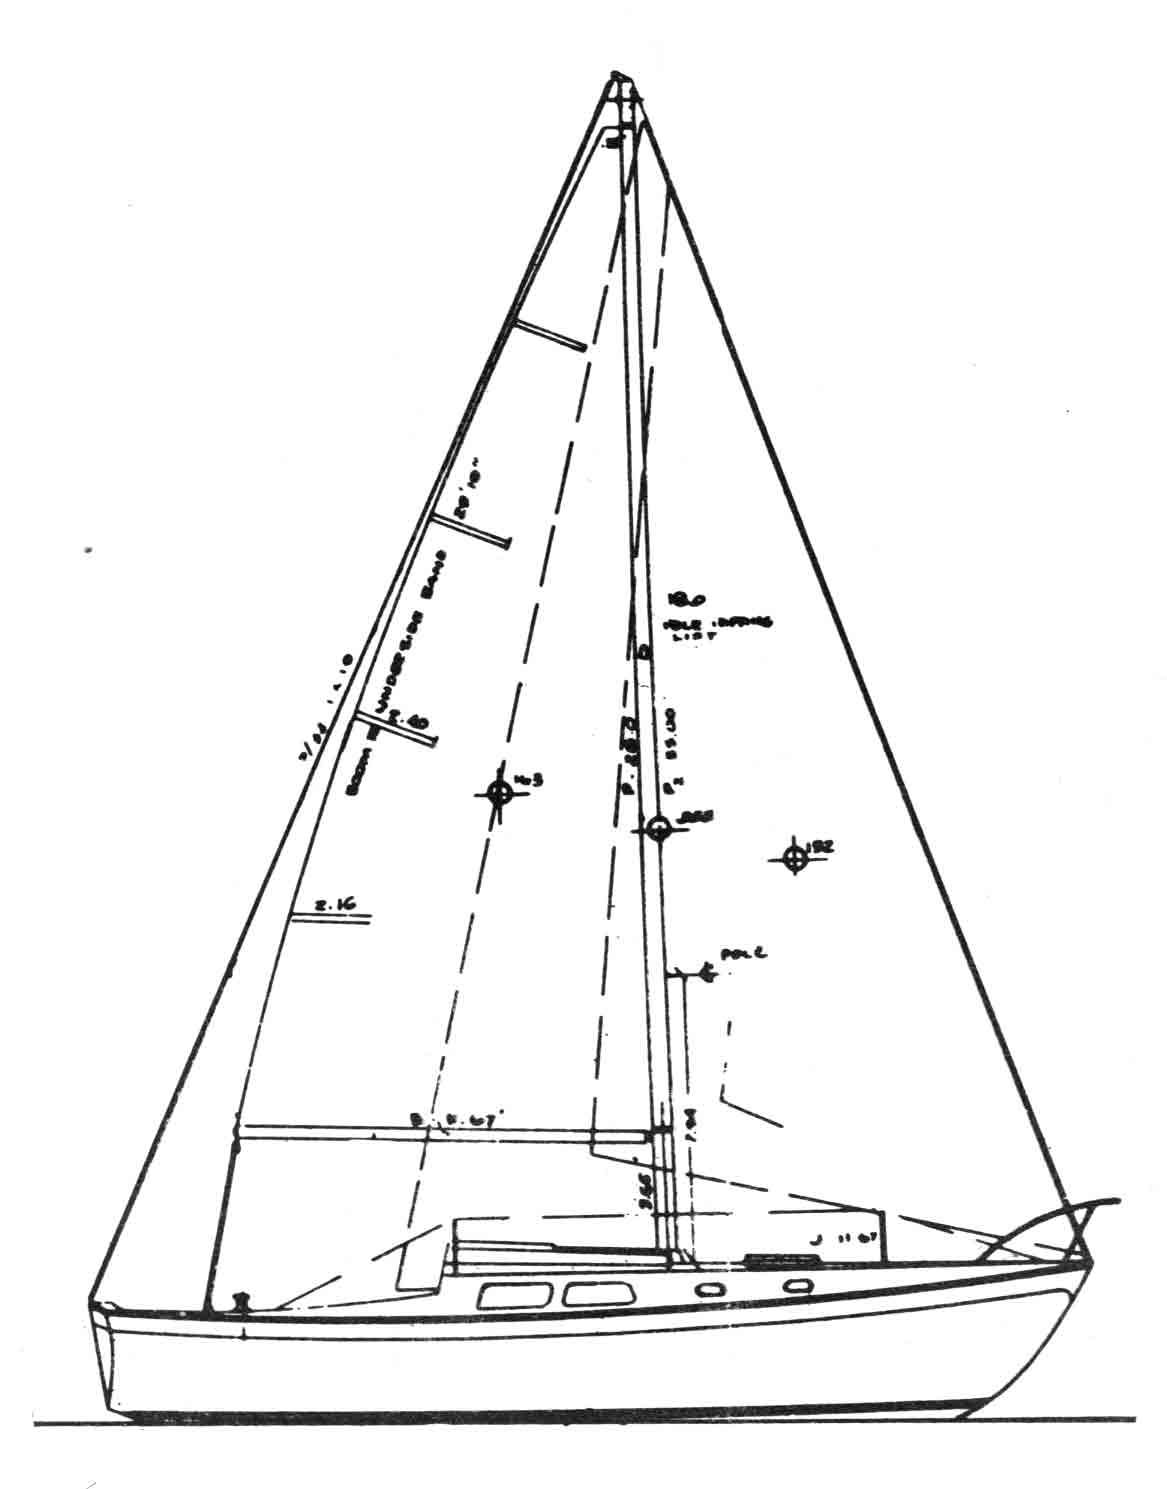 Cal 34 Sailboat from Jensen Marine